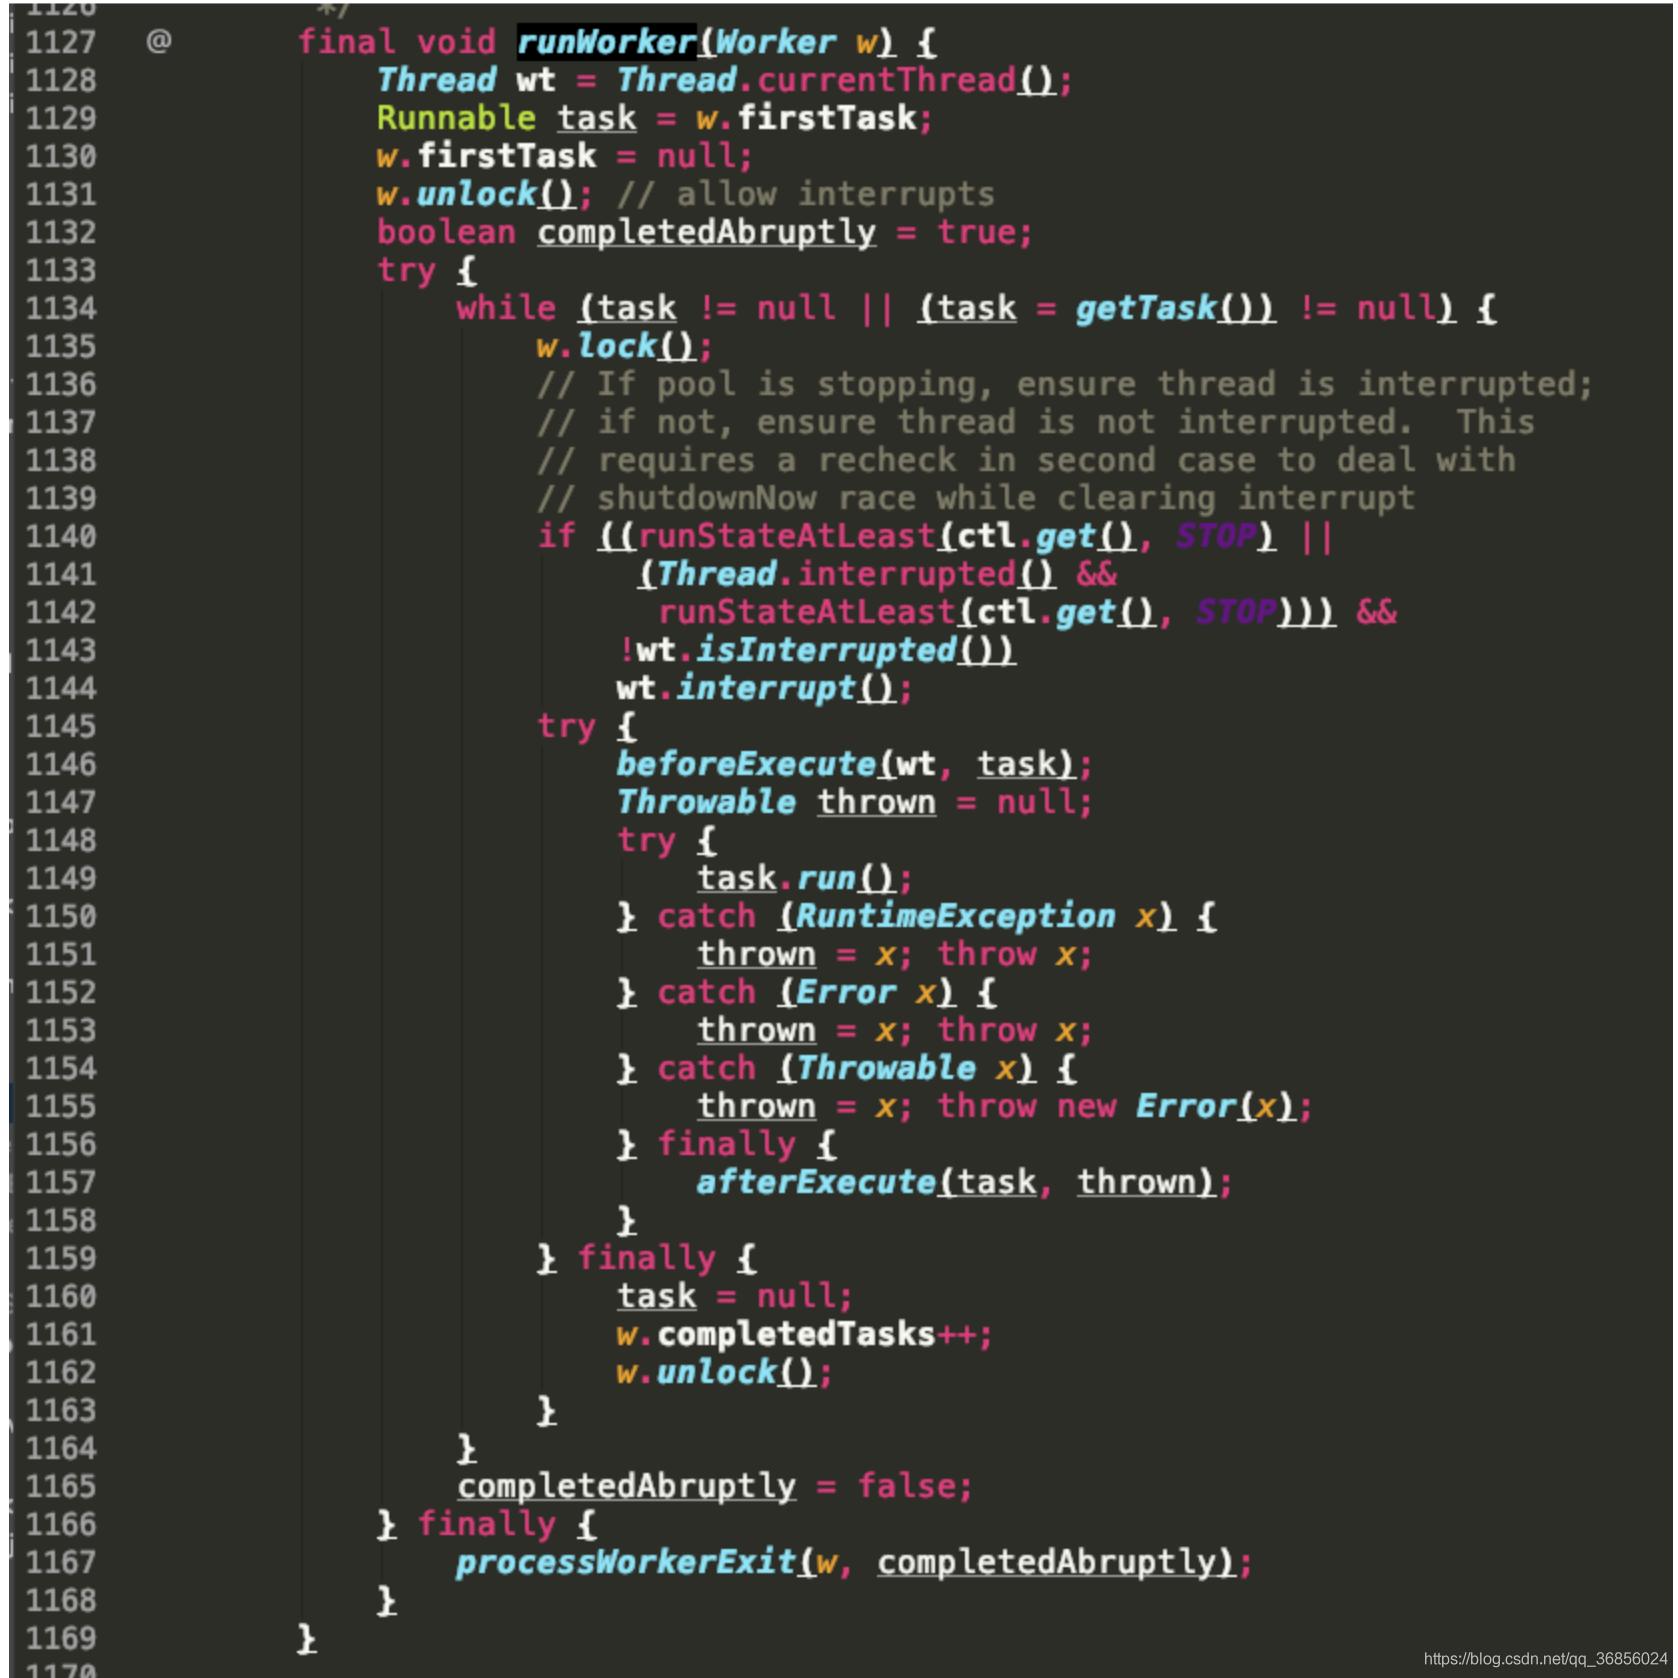 [外链图片转存失败,源站可能有防盗链机制,建议将图片保存下来直接上传(img-i6vYvlyP-1611288417532)(/Users/hhh/Library/Application Support/typora-user-images/image-20210121174531000.png)]